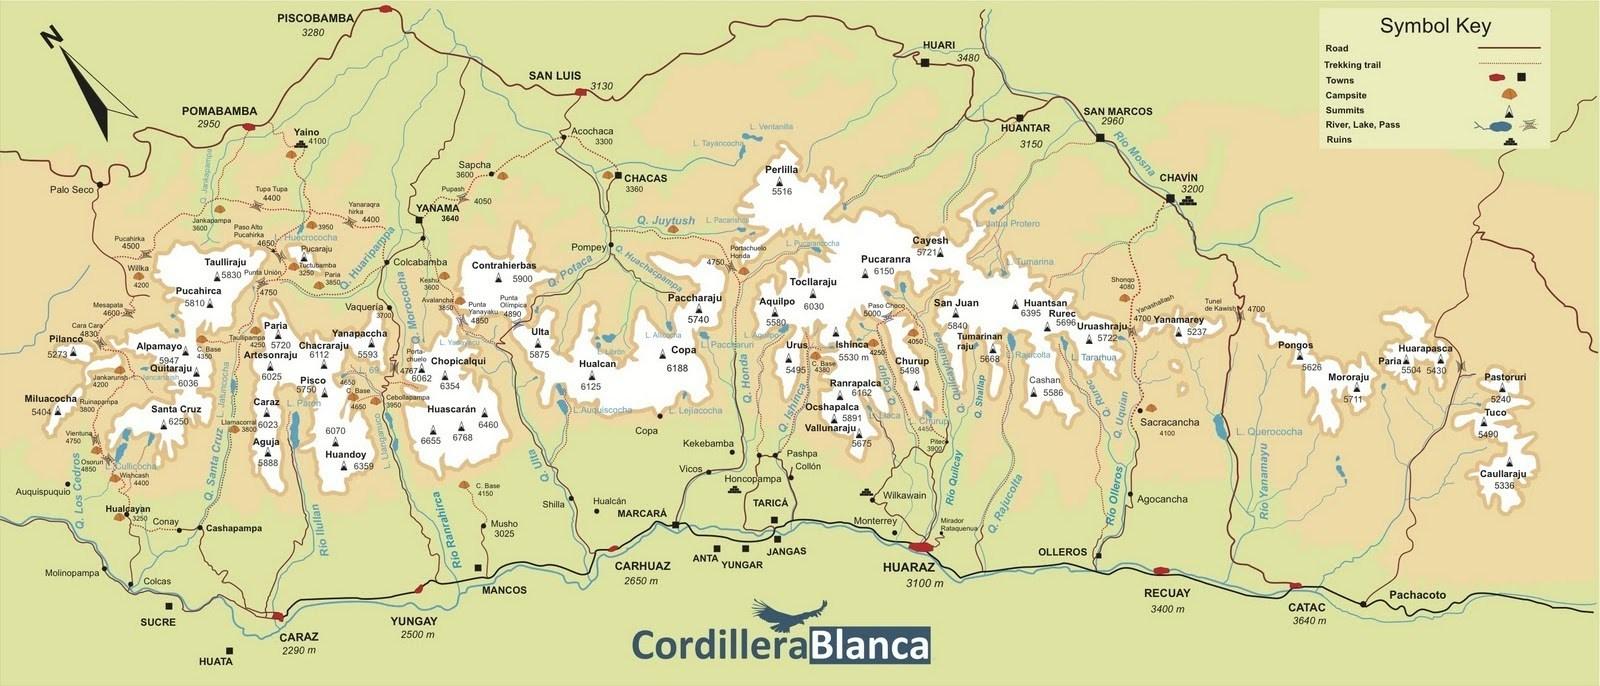 Cordillera-Blanca-Overview-Map.jpg